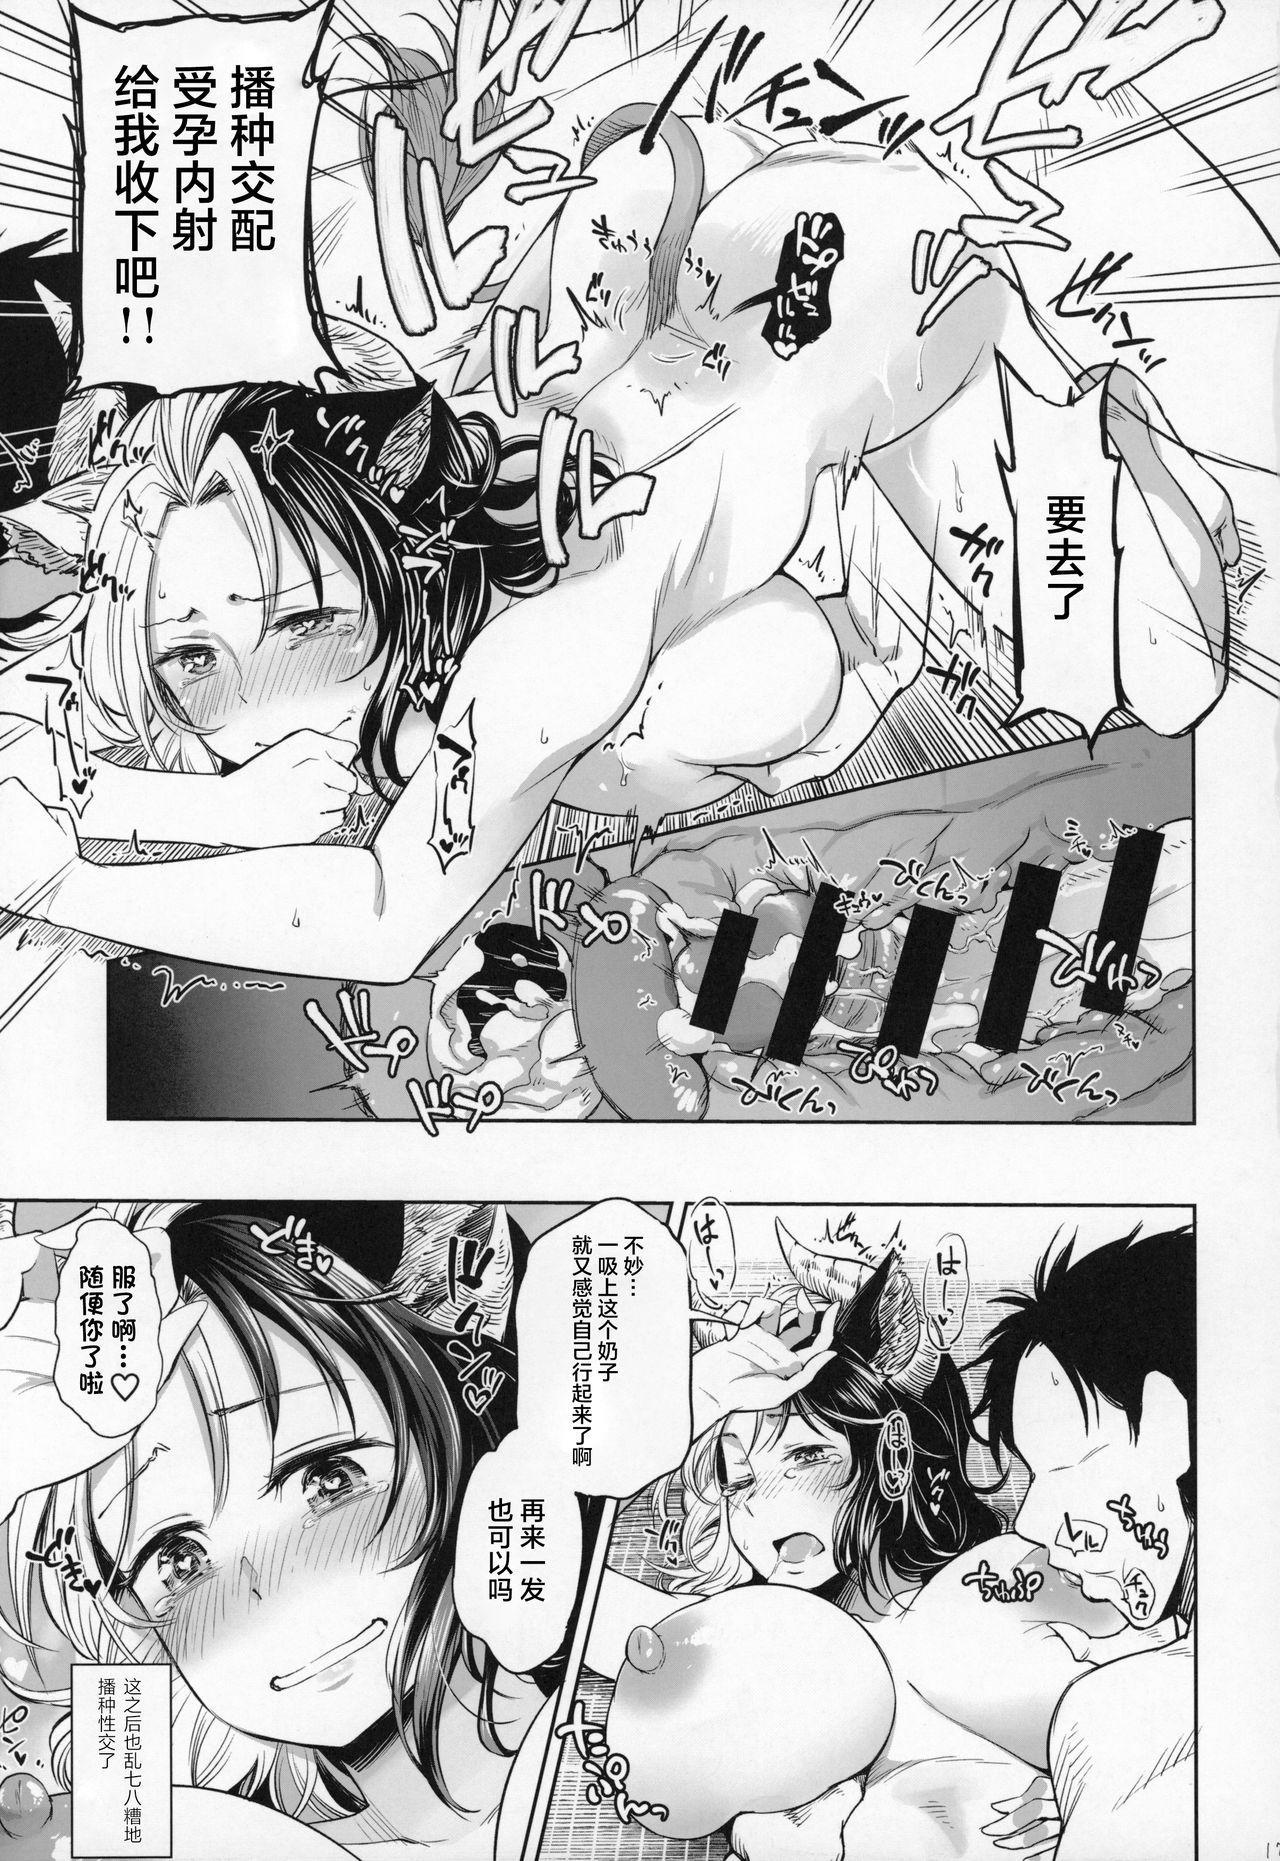 Mendoumi no Ii Ushizaki-san   照顾人的热心牛崎太太 15